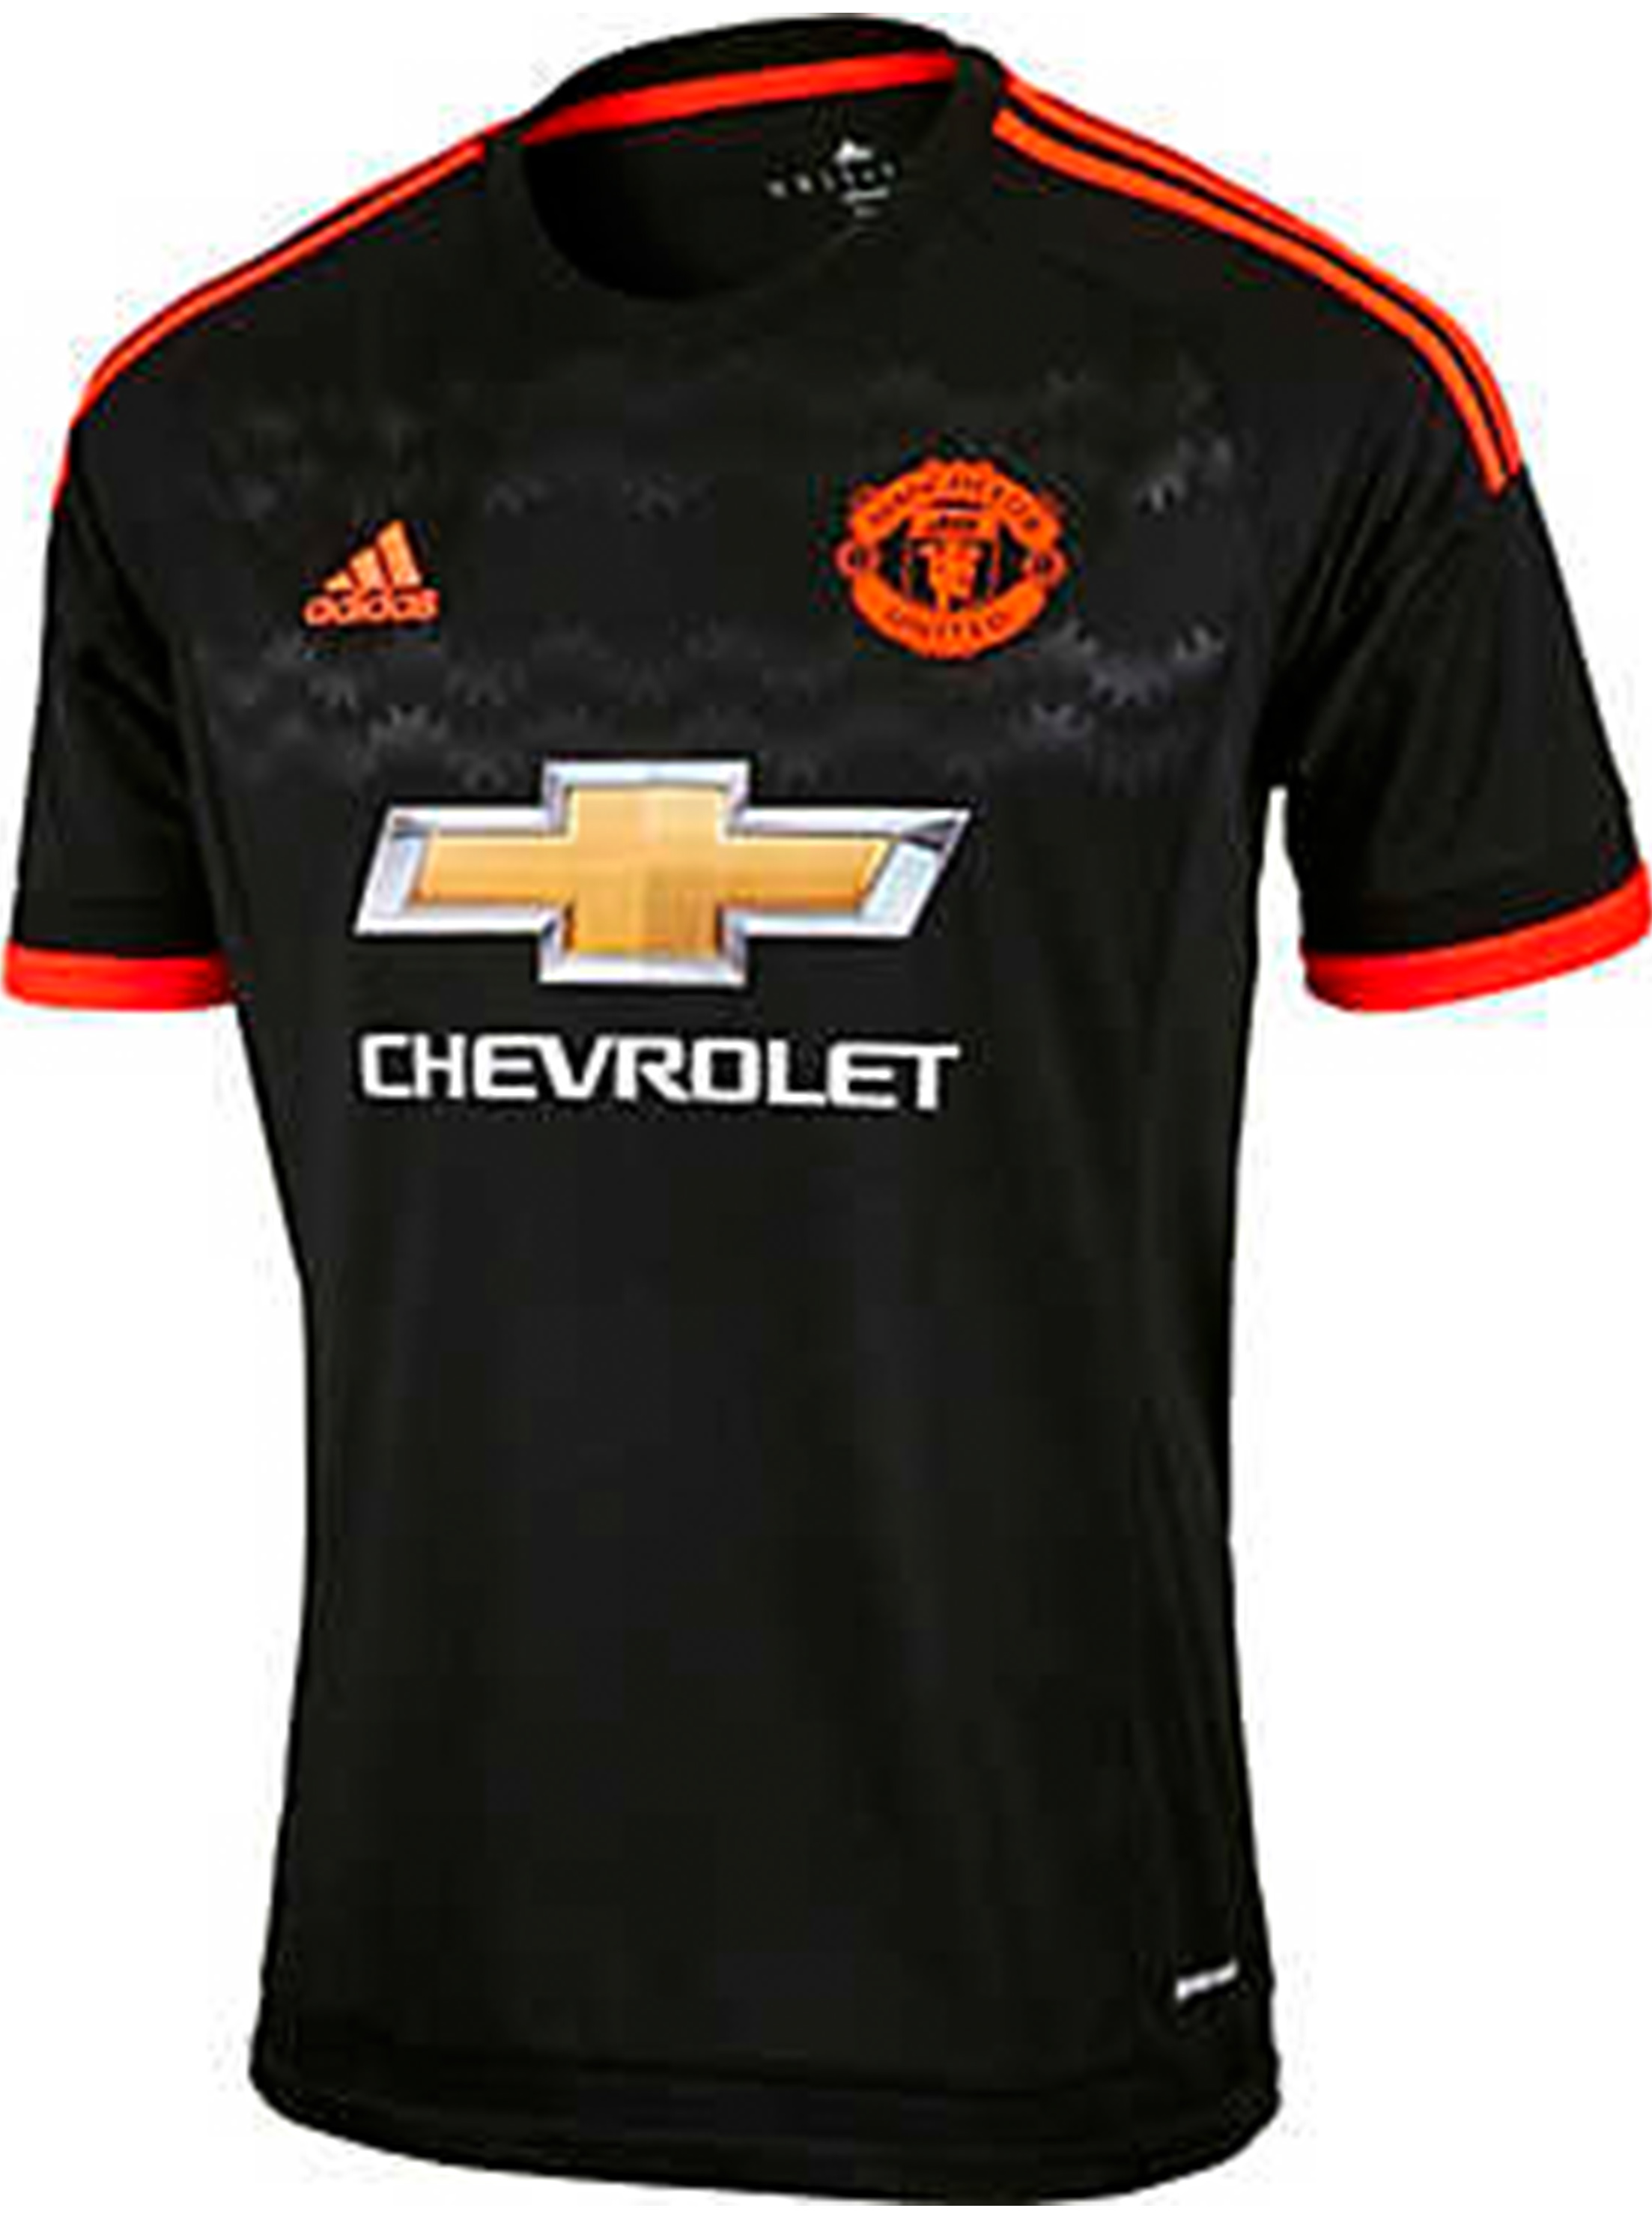 b76922d17a Camisa Manchester United infantil III Adidas > - Mega Saldão >